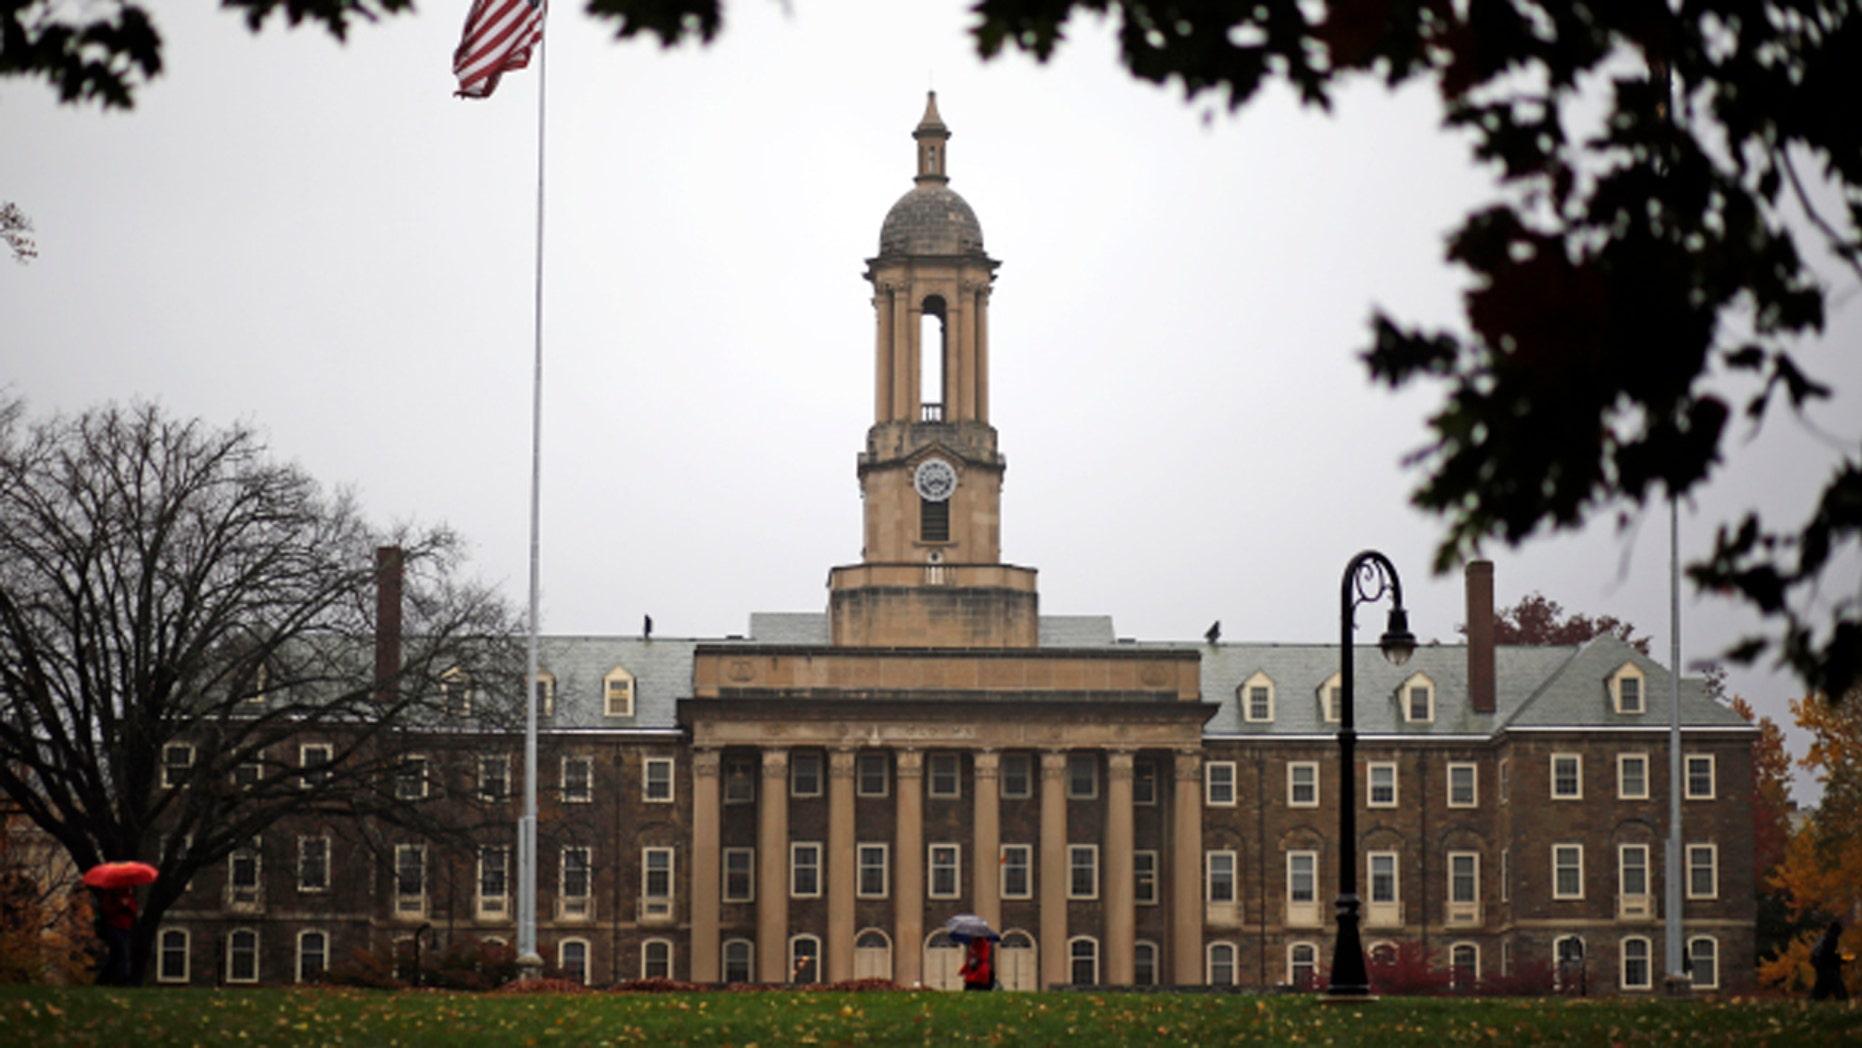 A Penn State student walks in the rain past Old Main on the Penn State main campus in State College, Pa., Wednesday, Oct. 28, 2015. (AP Photo/Gene J. Puskar)